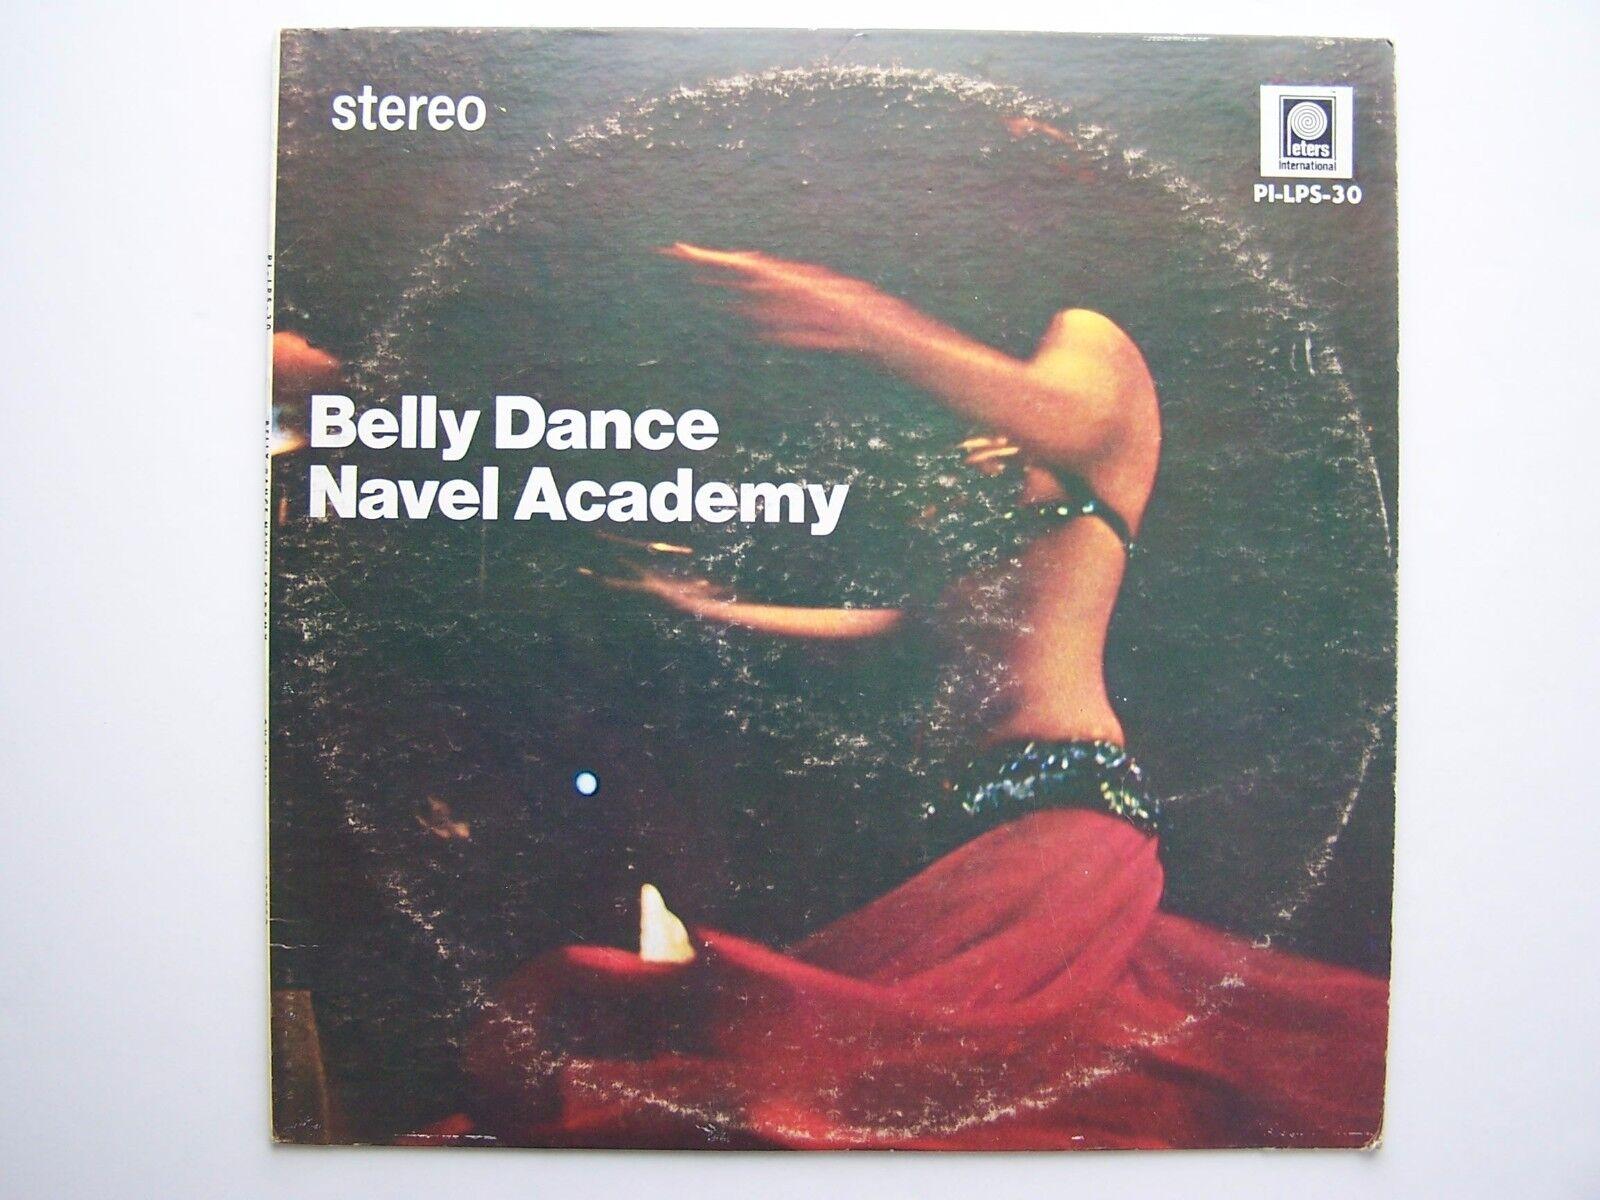 Gus Vali - Belly Dance Navel Academy Vinyl LP Record Al